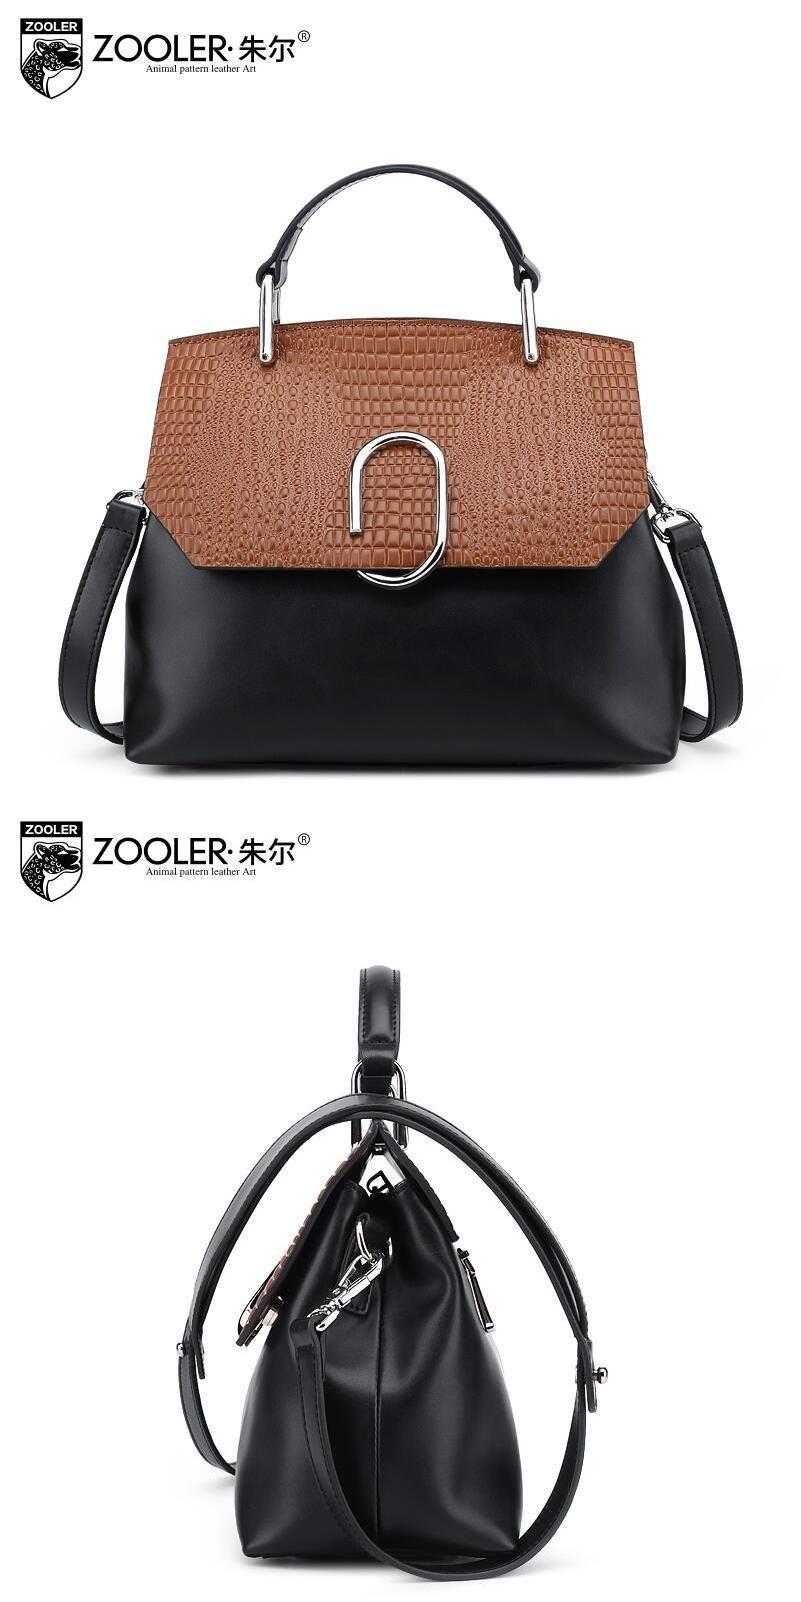 38af3335ee  Visit to Buy  ZOOLER2016 new high-quality luxury fashion brand handbag  serpentine leather